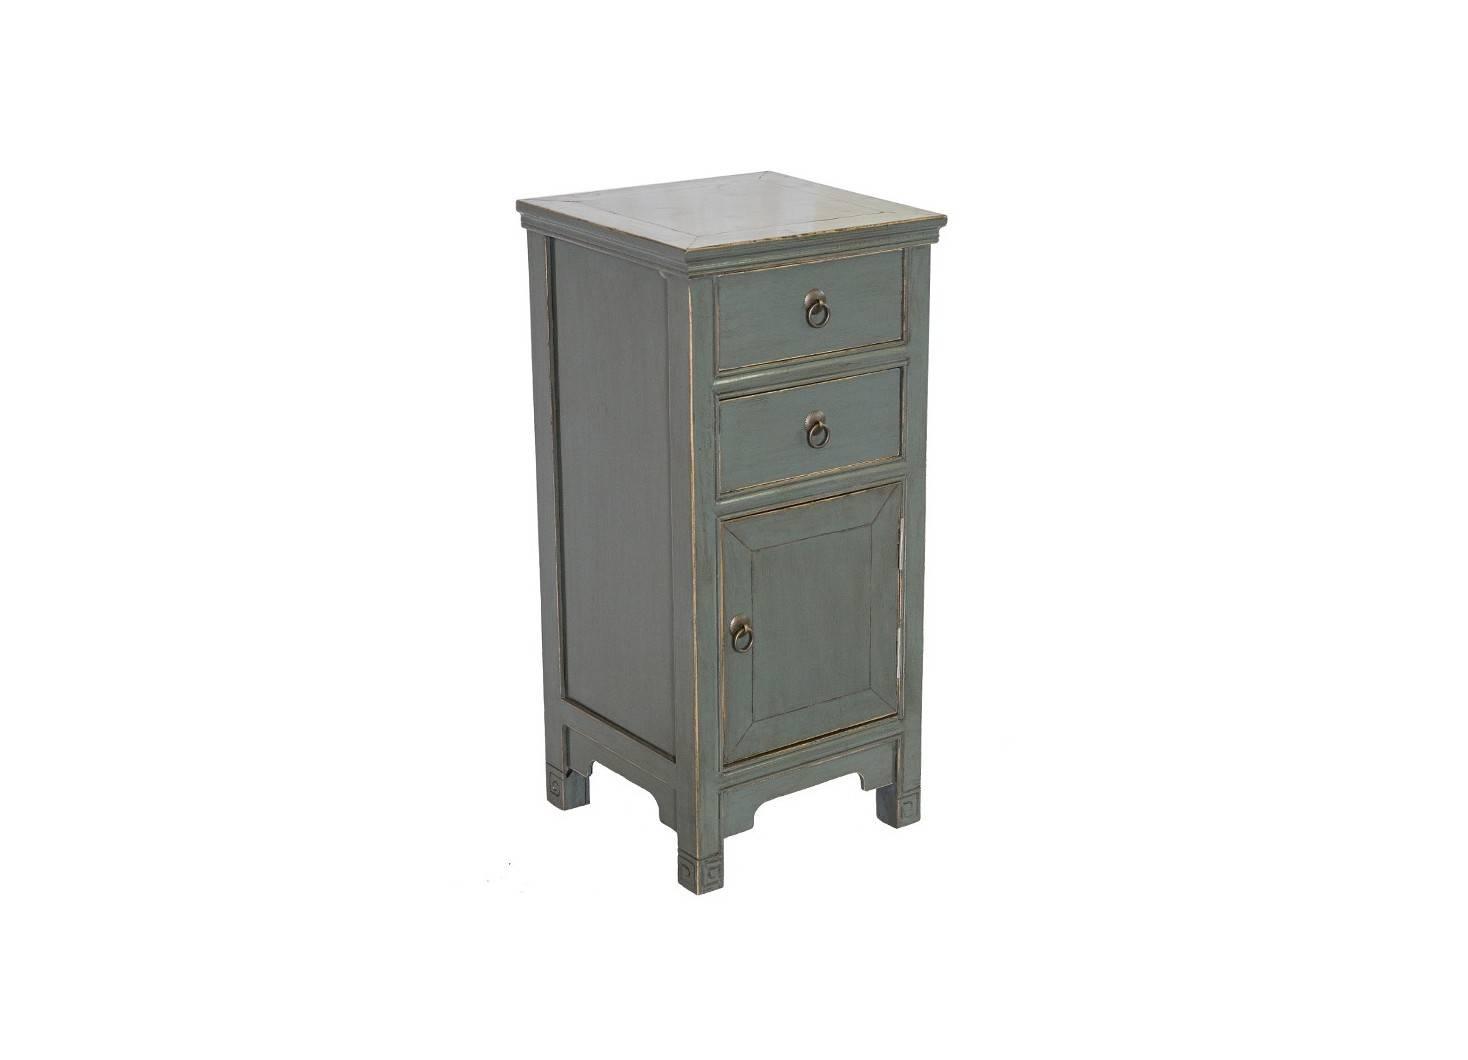 Meuble d'appoint Chinois - 1 porte 2 tiroirs - Vert de gris